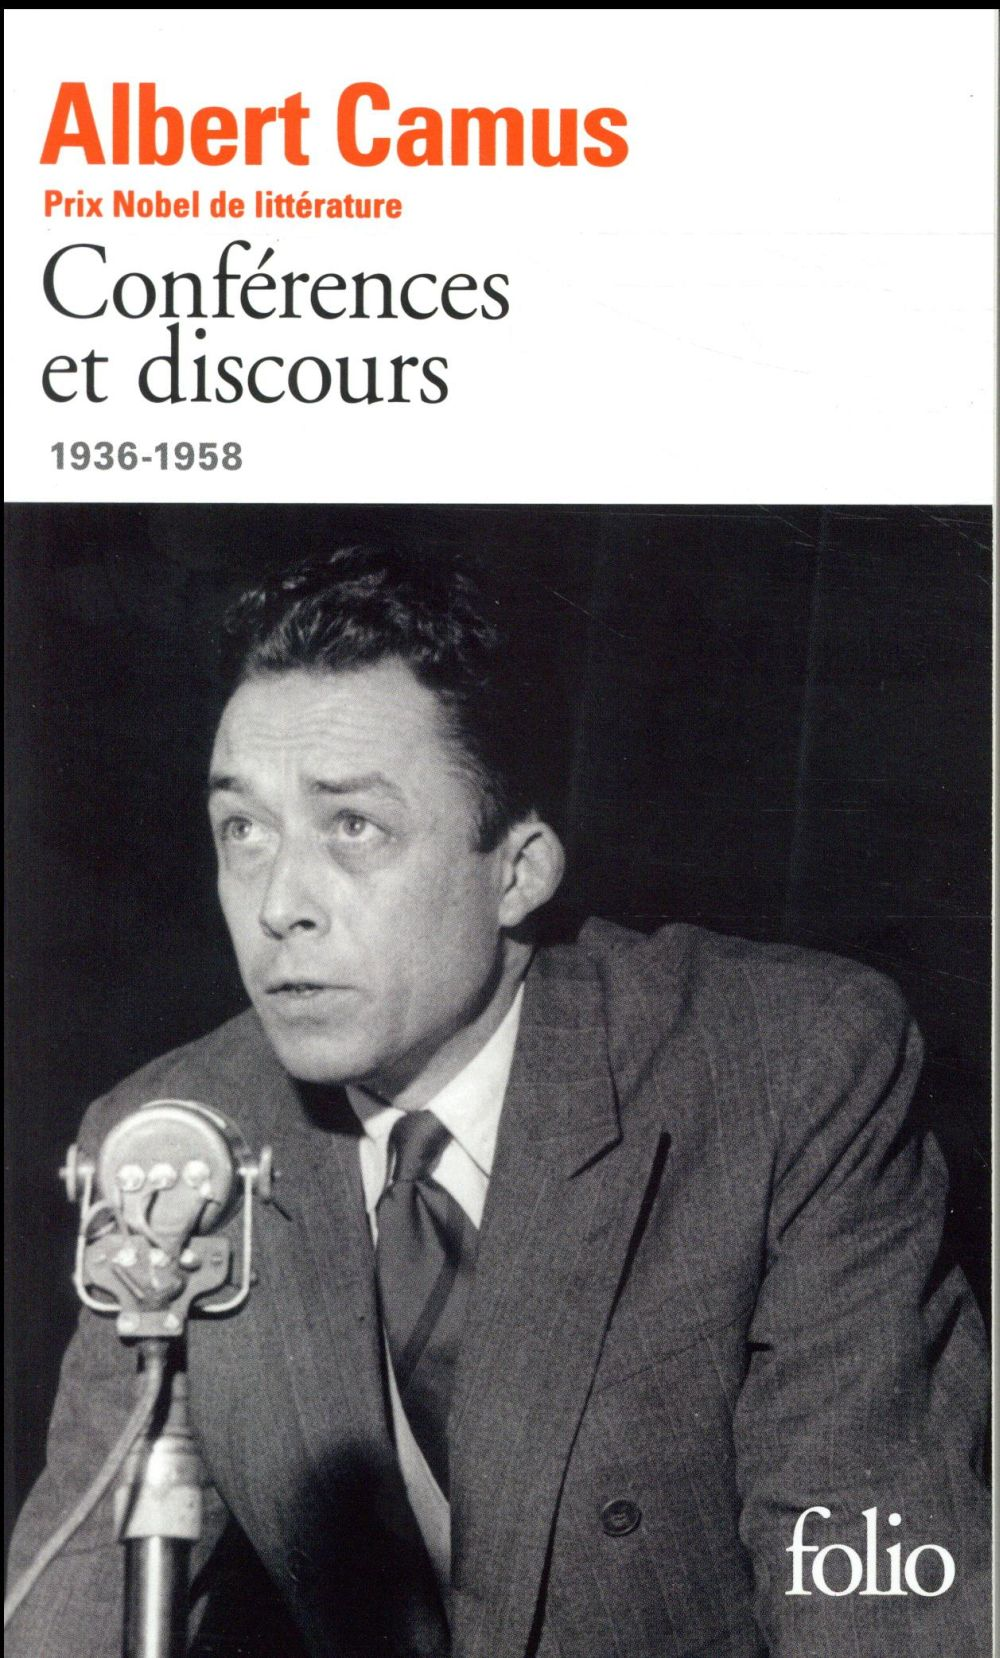 CONFERENCES ET DISCOURS - (193 CAMUS ALBERT GALLIMARD